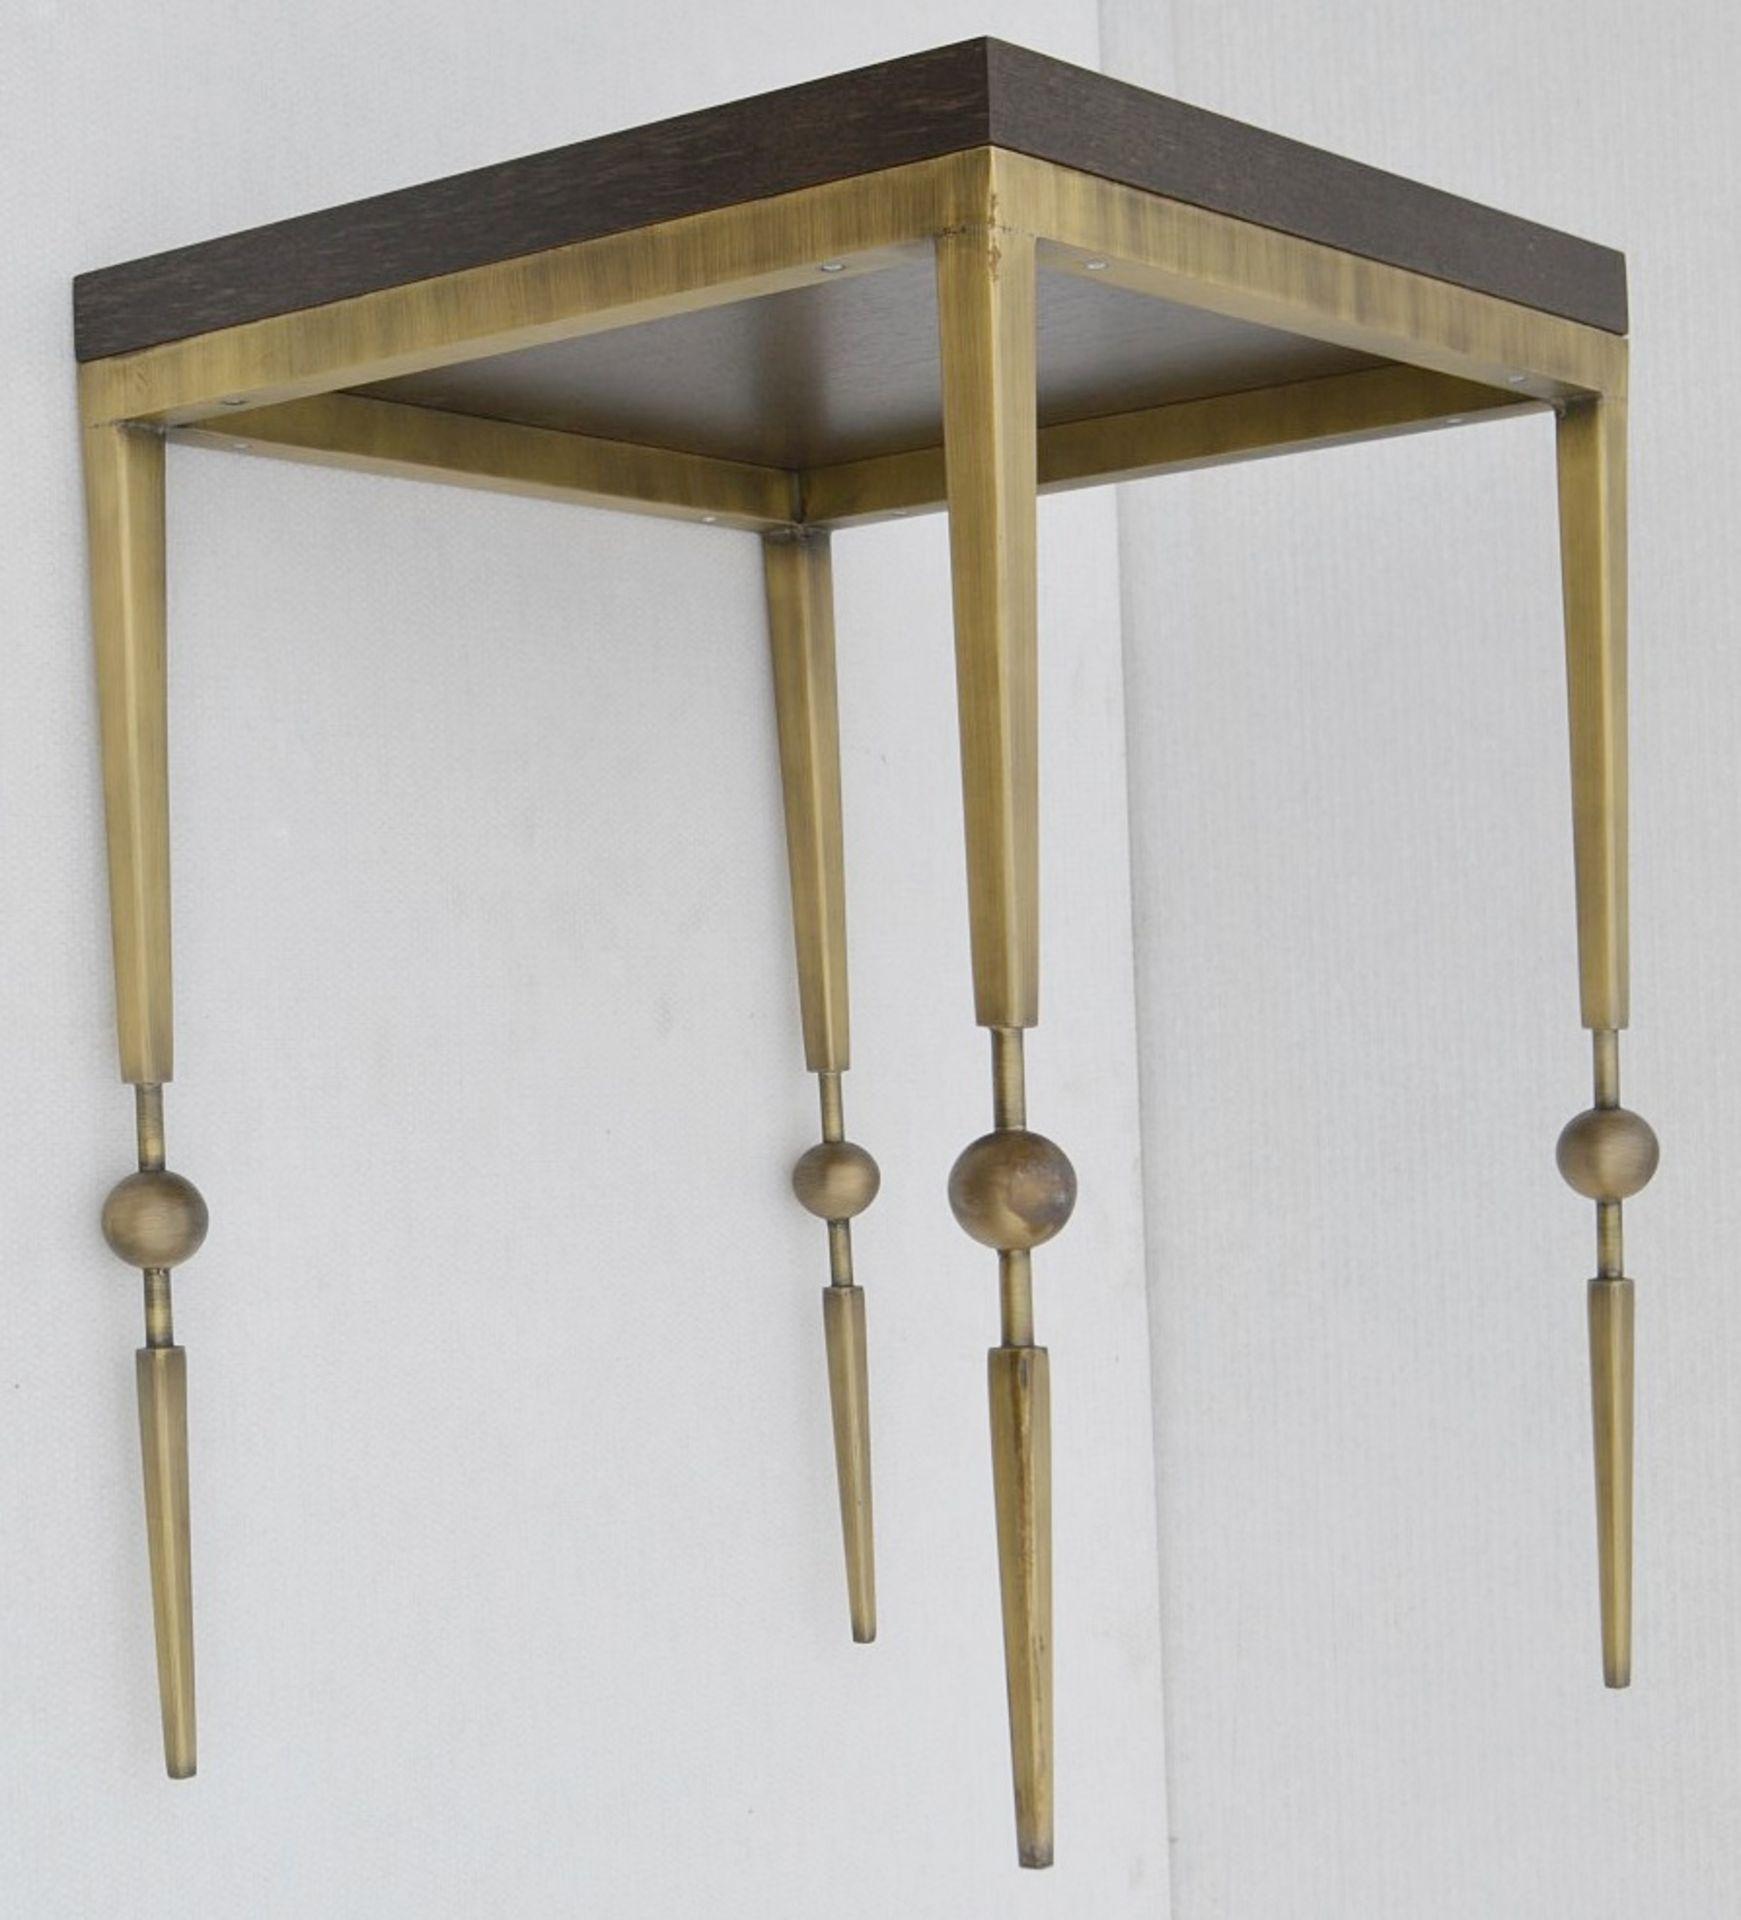 1 x JUSTIN VAN BREDA 'Sphere' Designer Occasional Table - Dimensions: H70 x W52 x D52cm - Ref: - Image 4 of 7